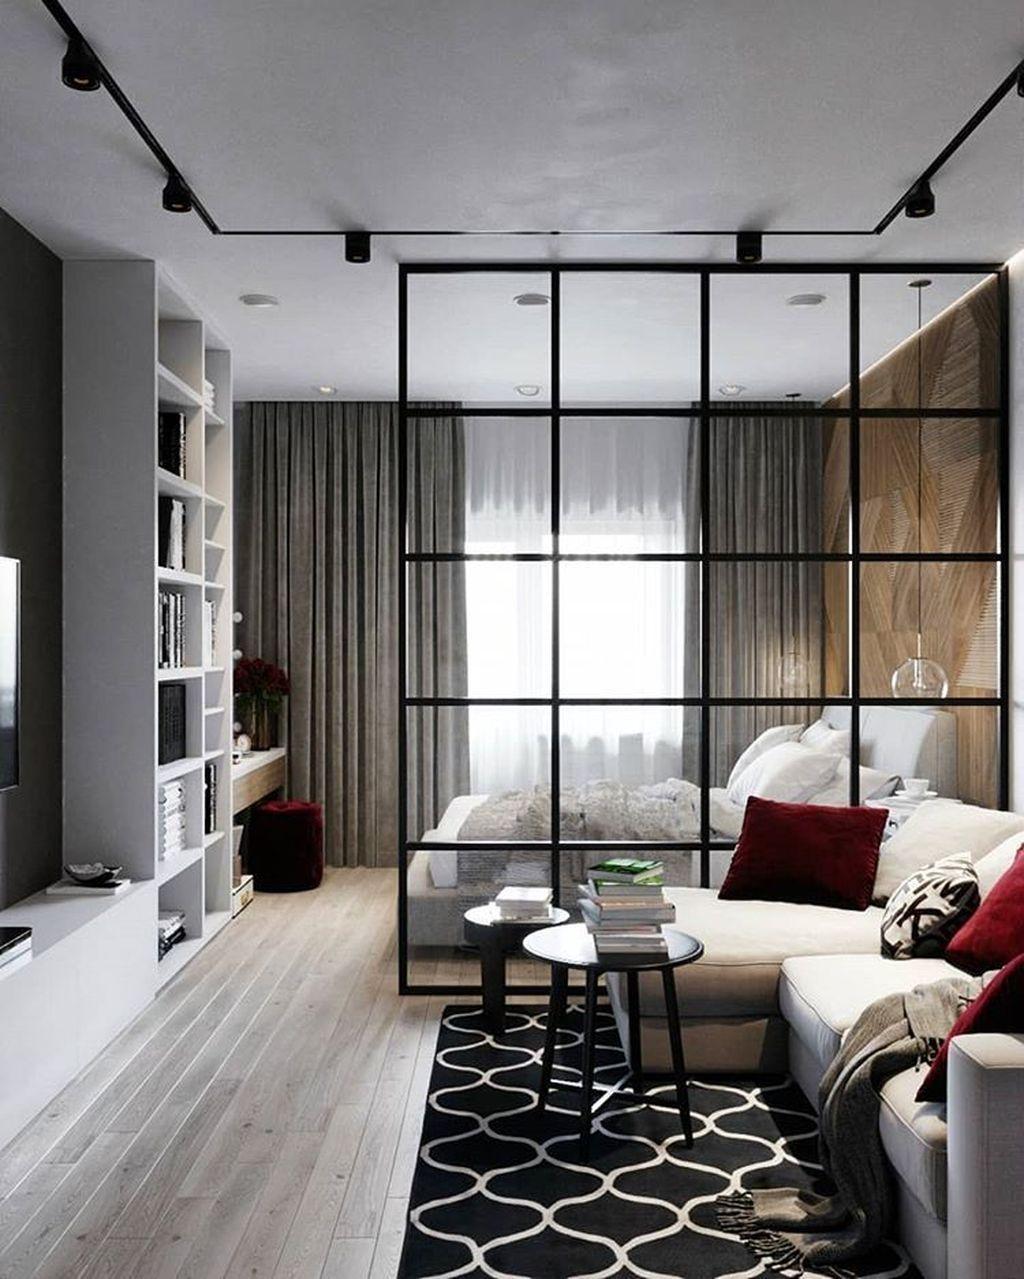 20 Fabulous Studio Apartment Dekor Ideen Auf Ein Budget Fantastische 20 Fabe Apartme Small Apartment Interior Studio Apartment Decorating Apartment Room